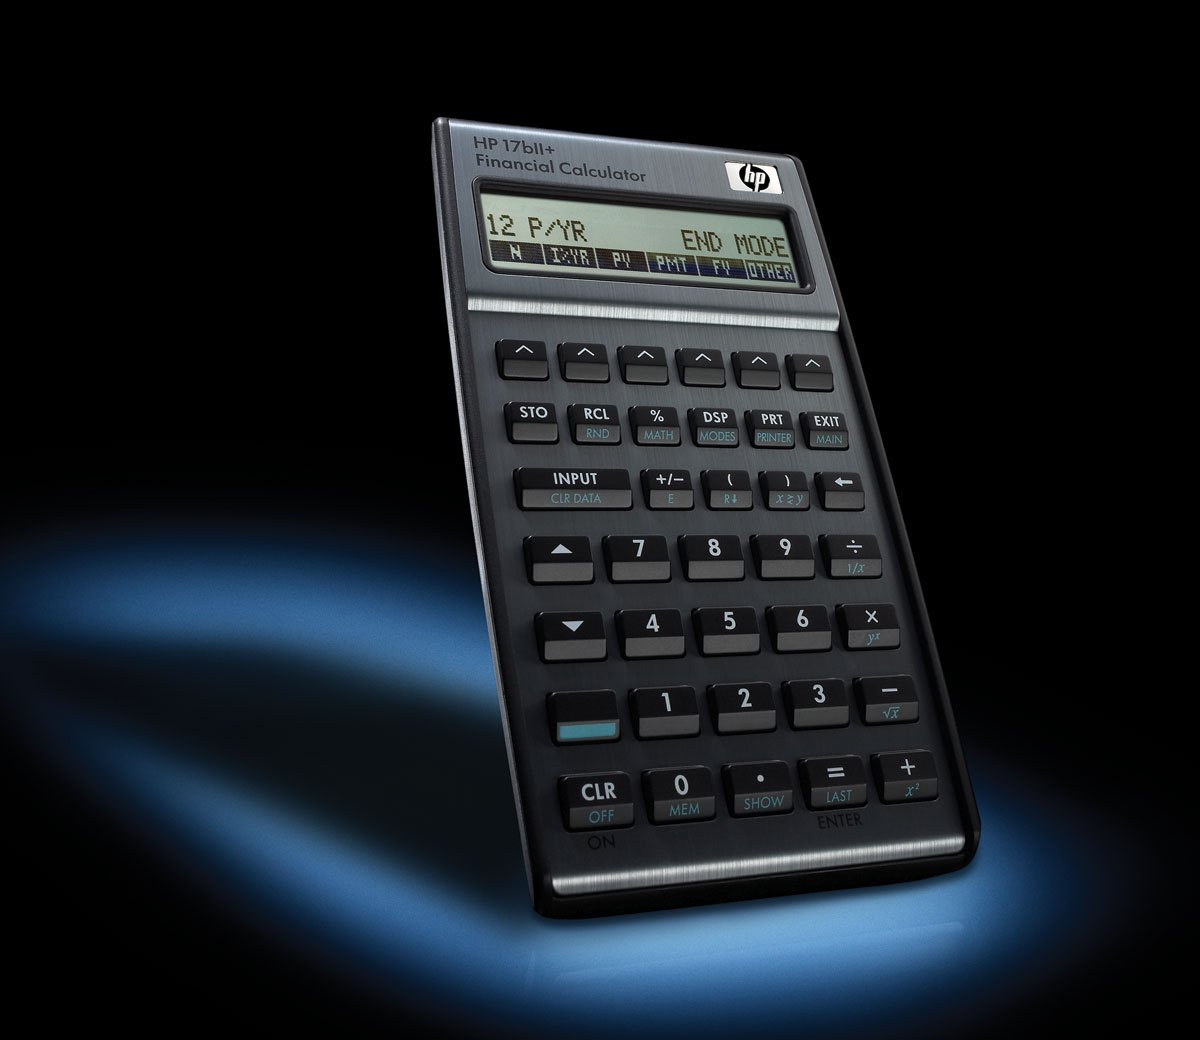 Hp 17bii+ Programmable Financial Calculator Bilingual Package Hewlett Packard HP17BII+